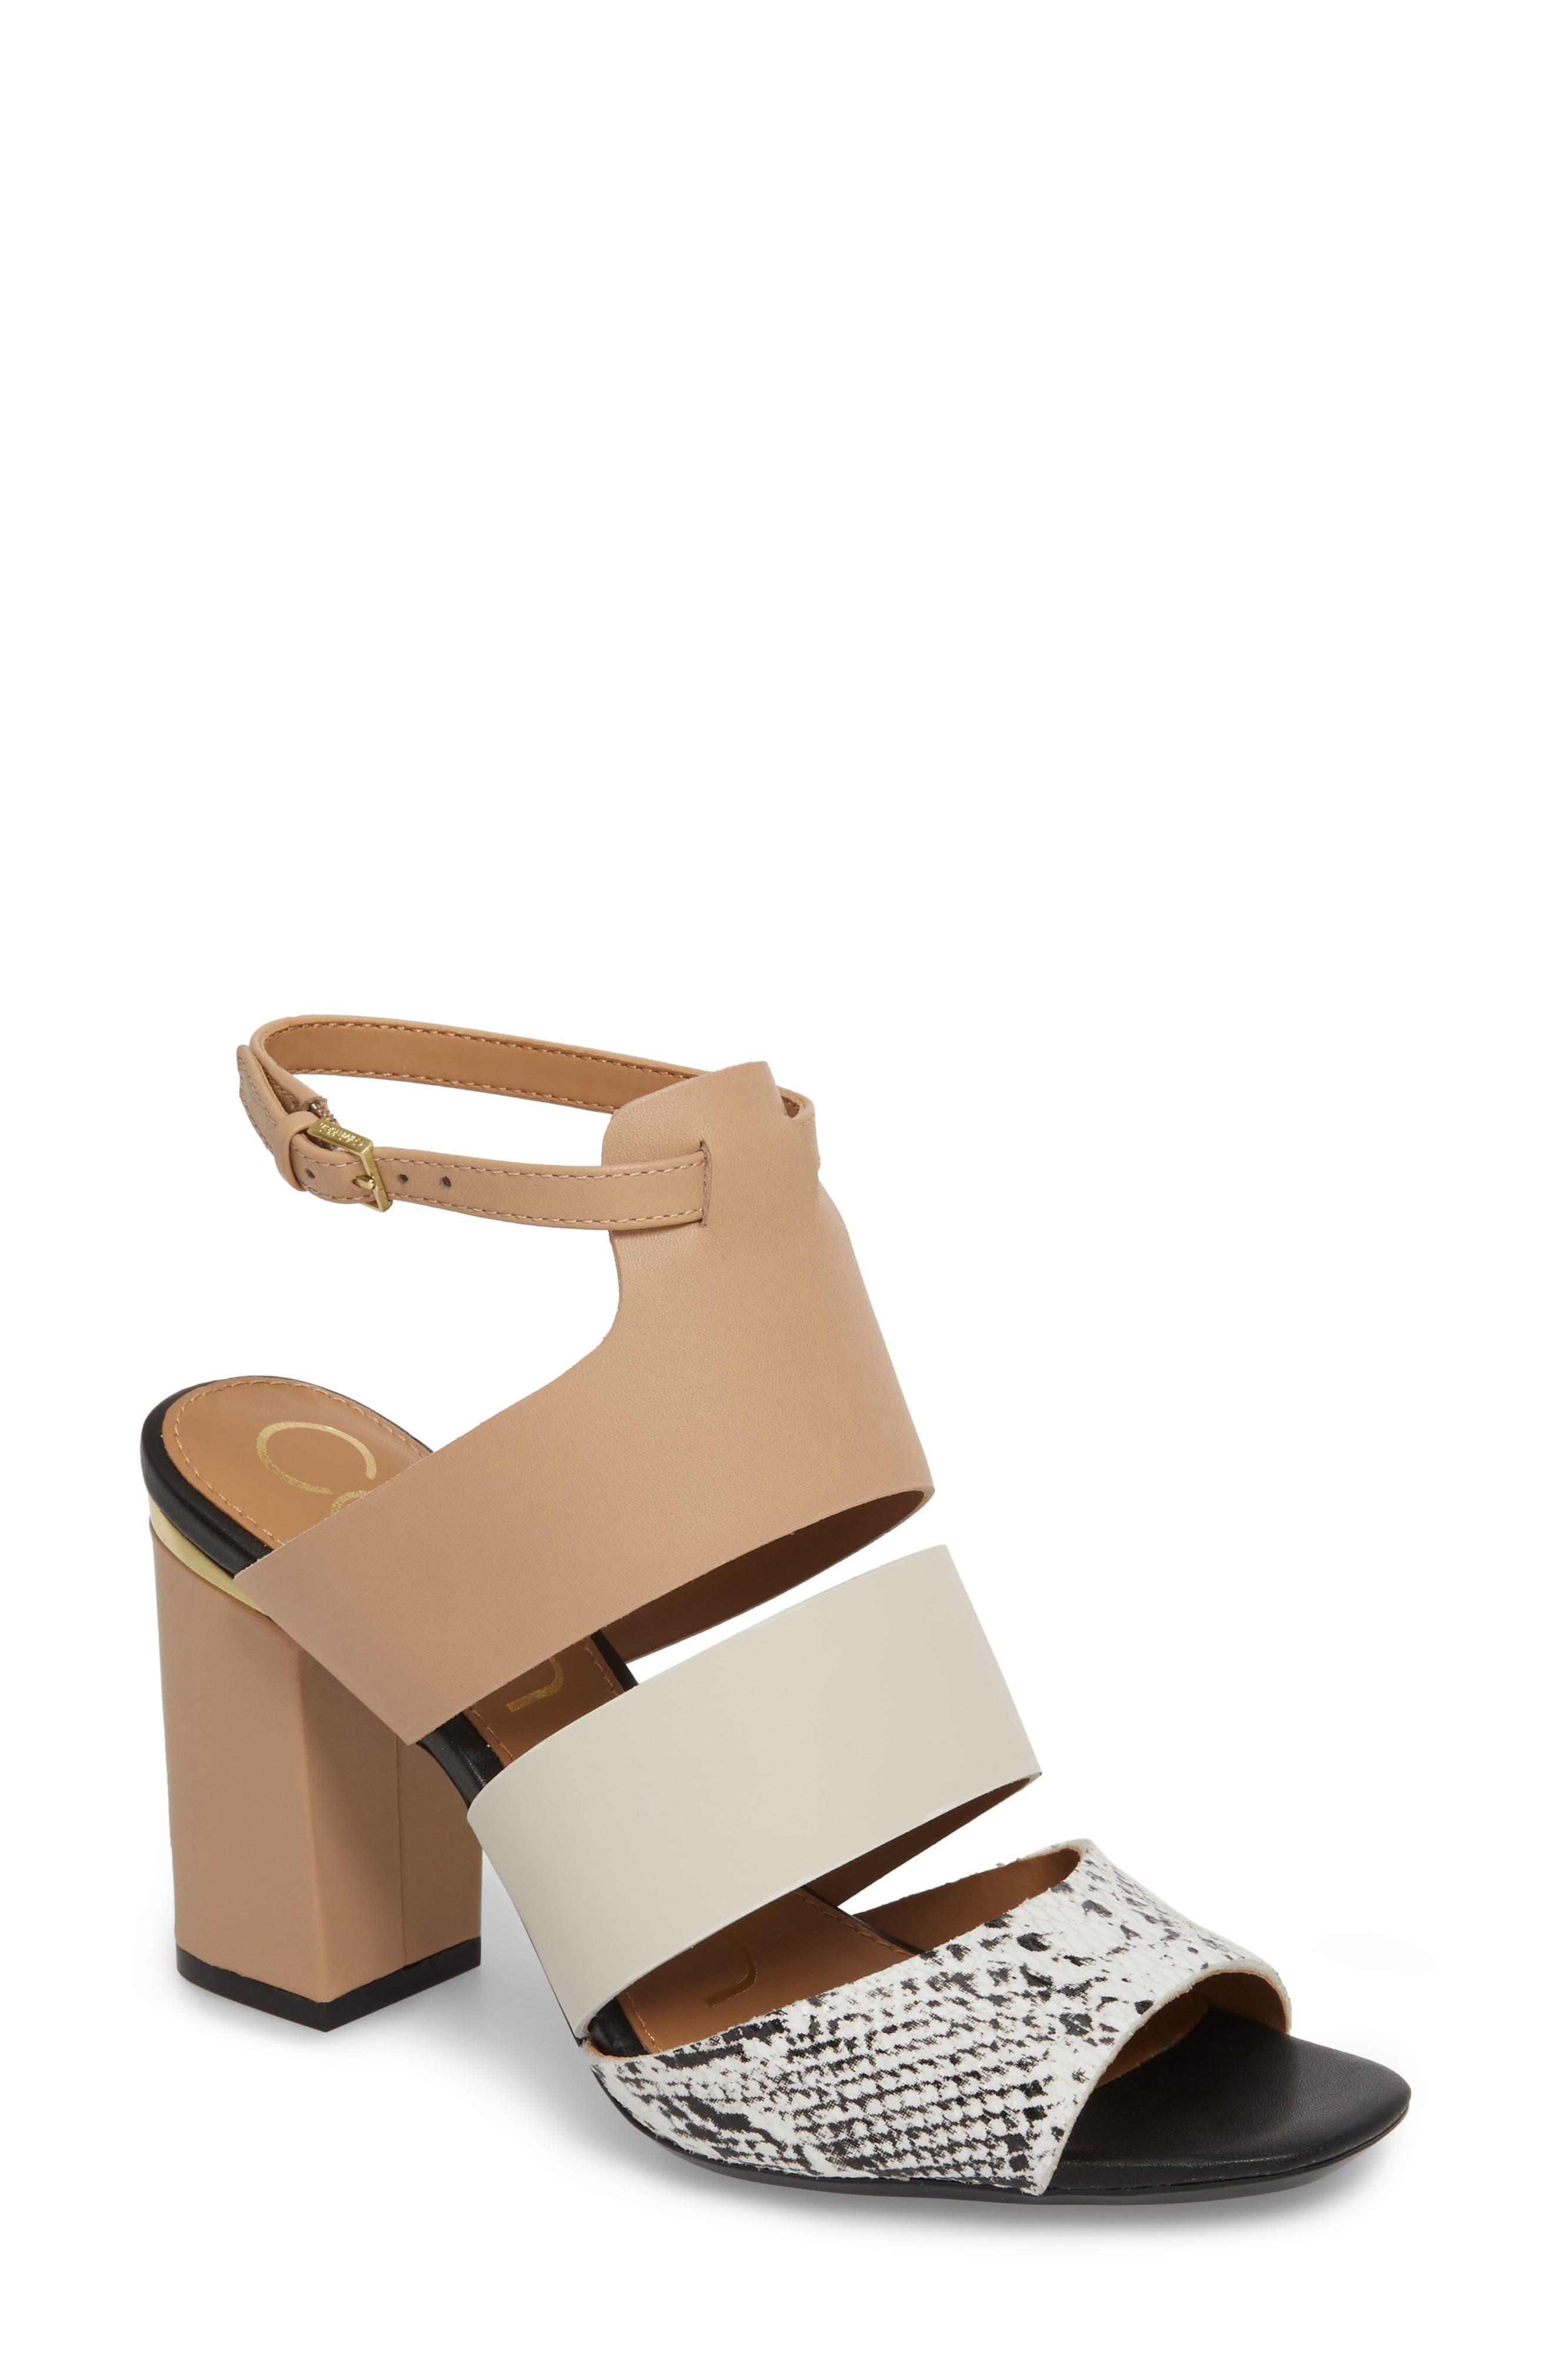 Caran Block Heel Sandal,                         Main,                         color, Black/ White Leather